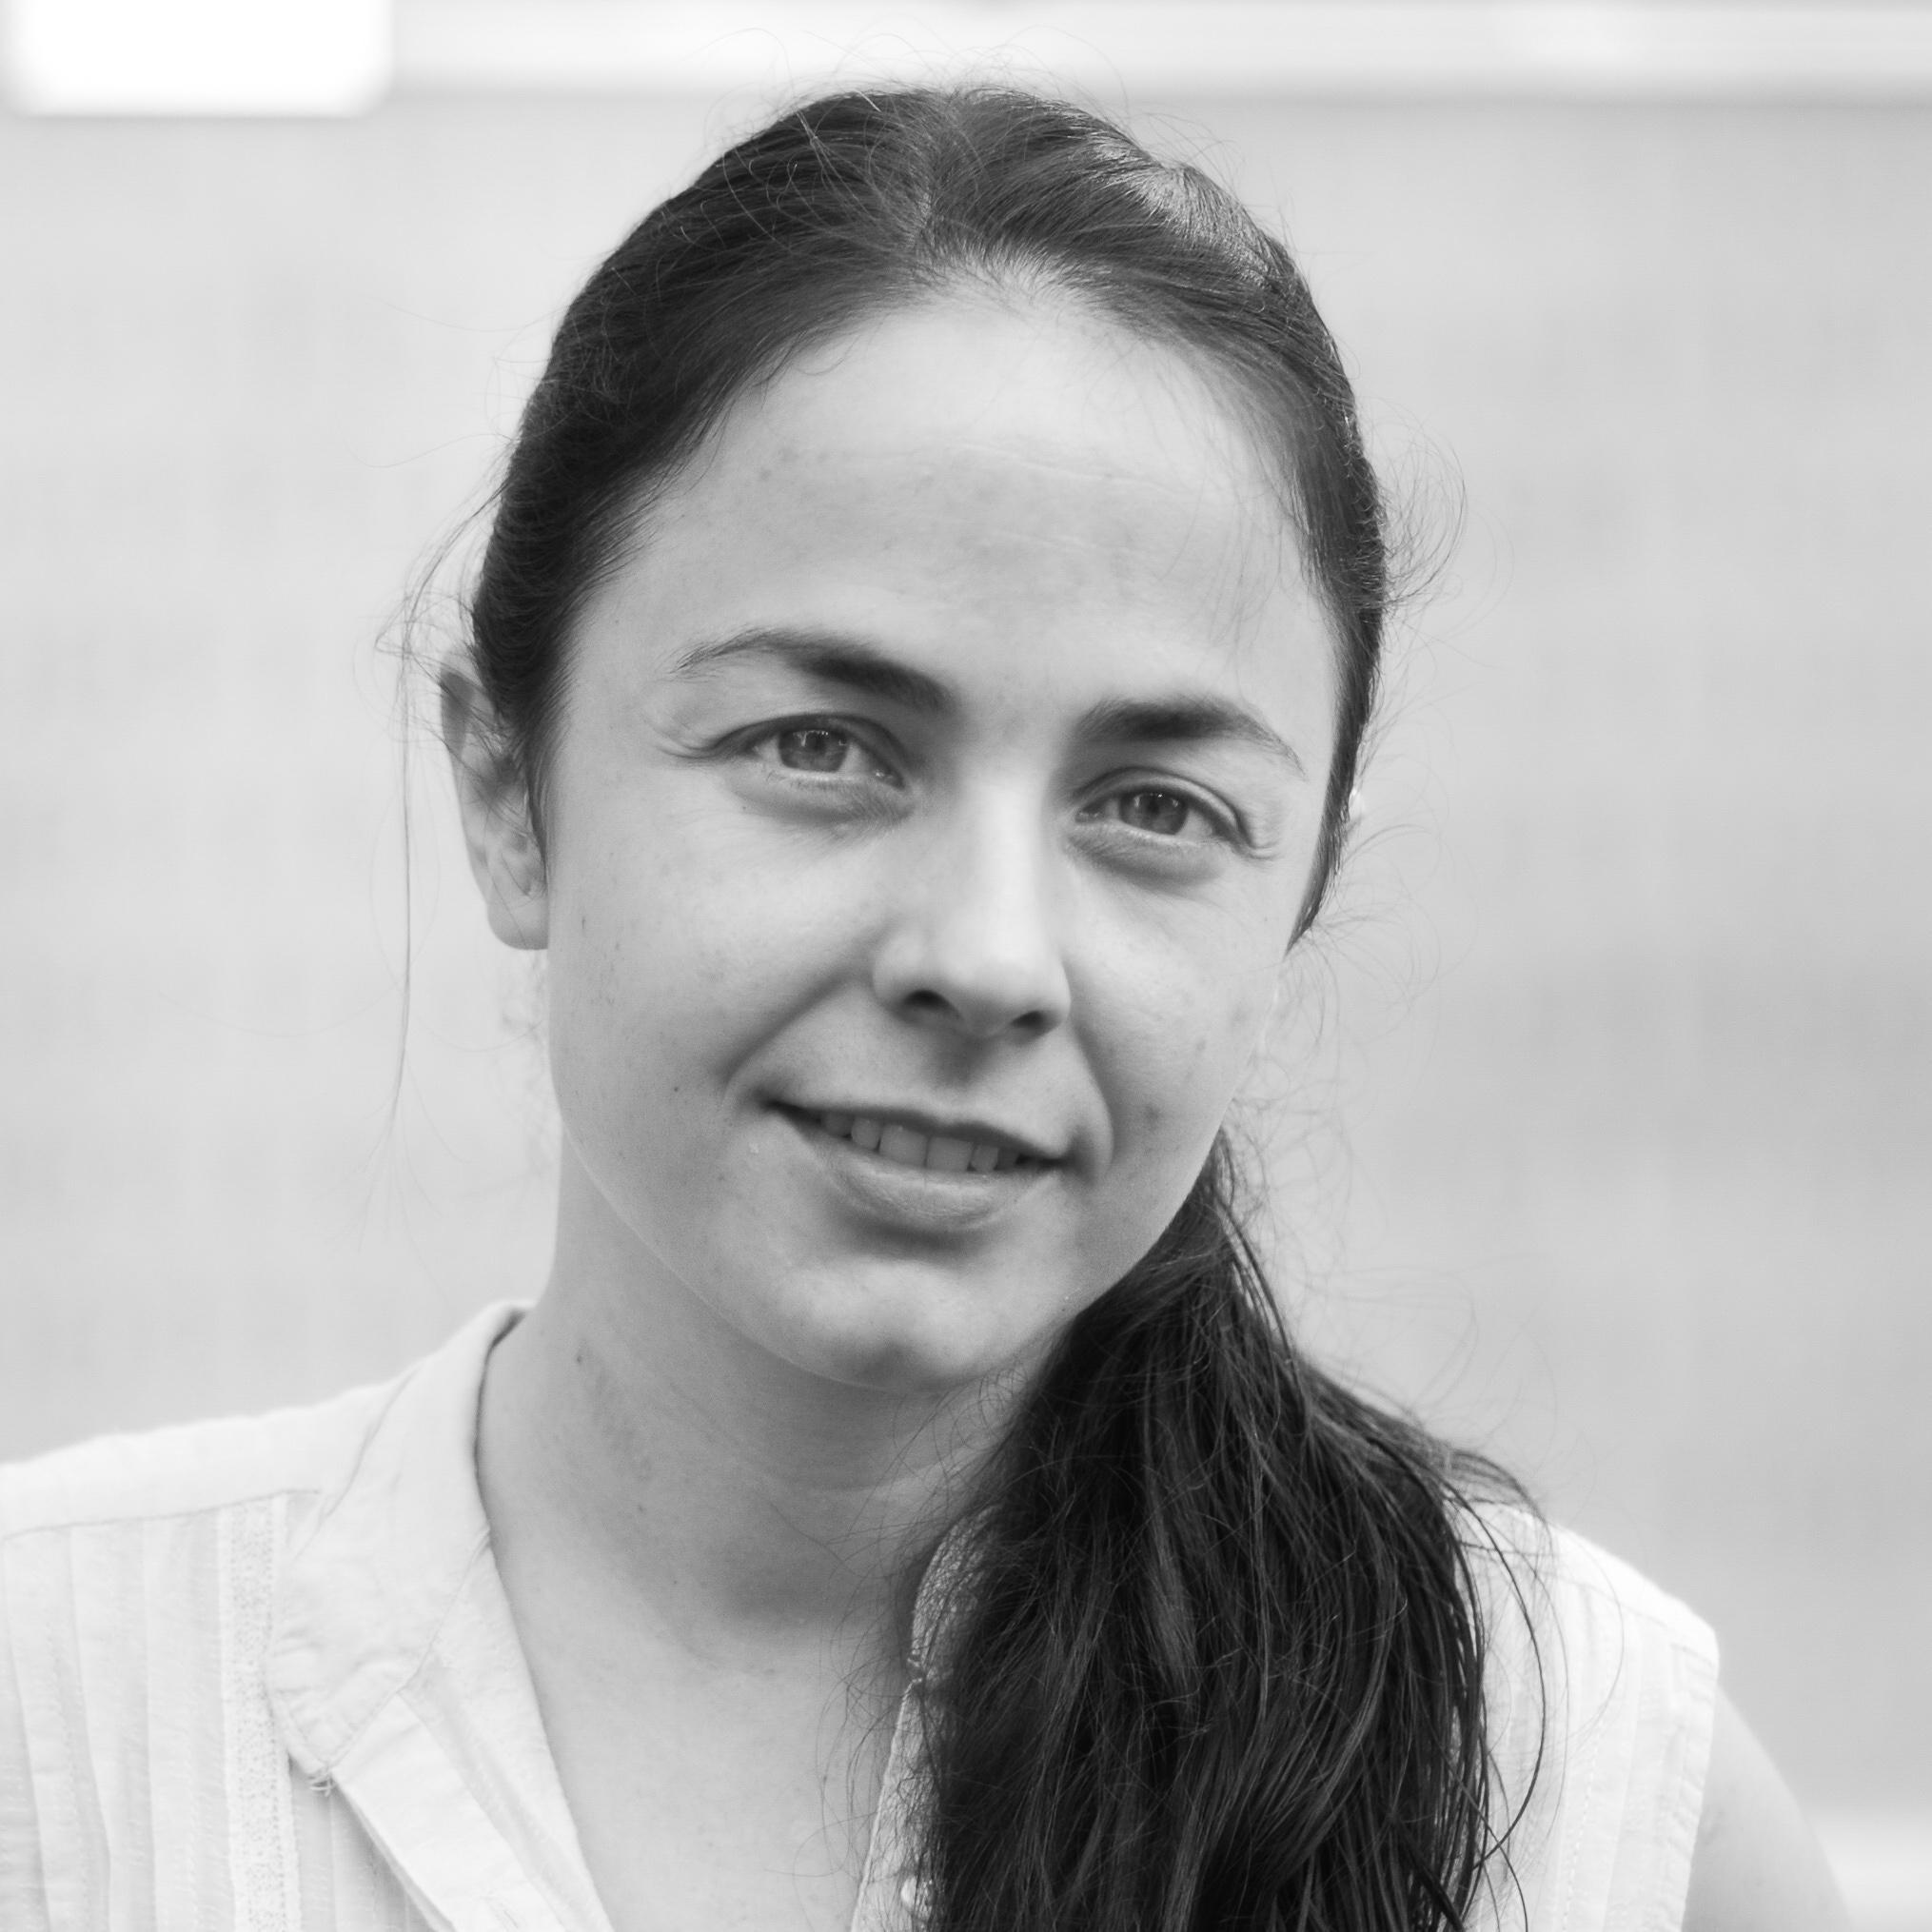 Teresa Lapesa Gandía